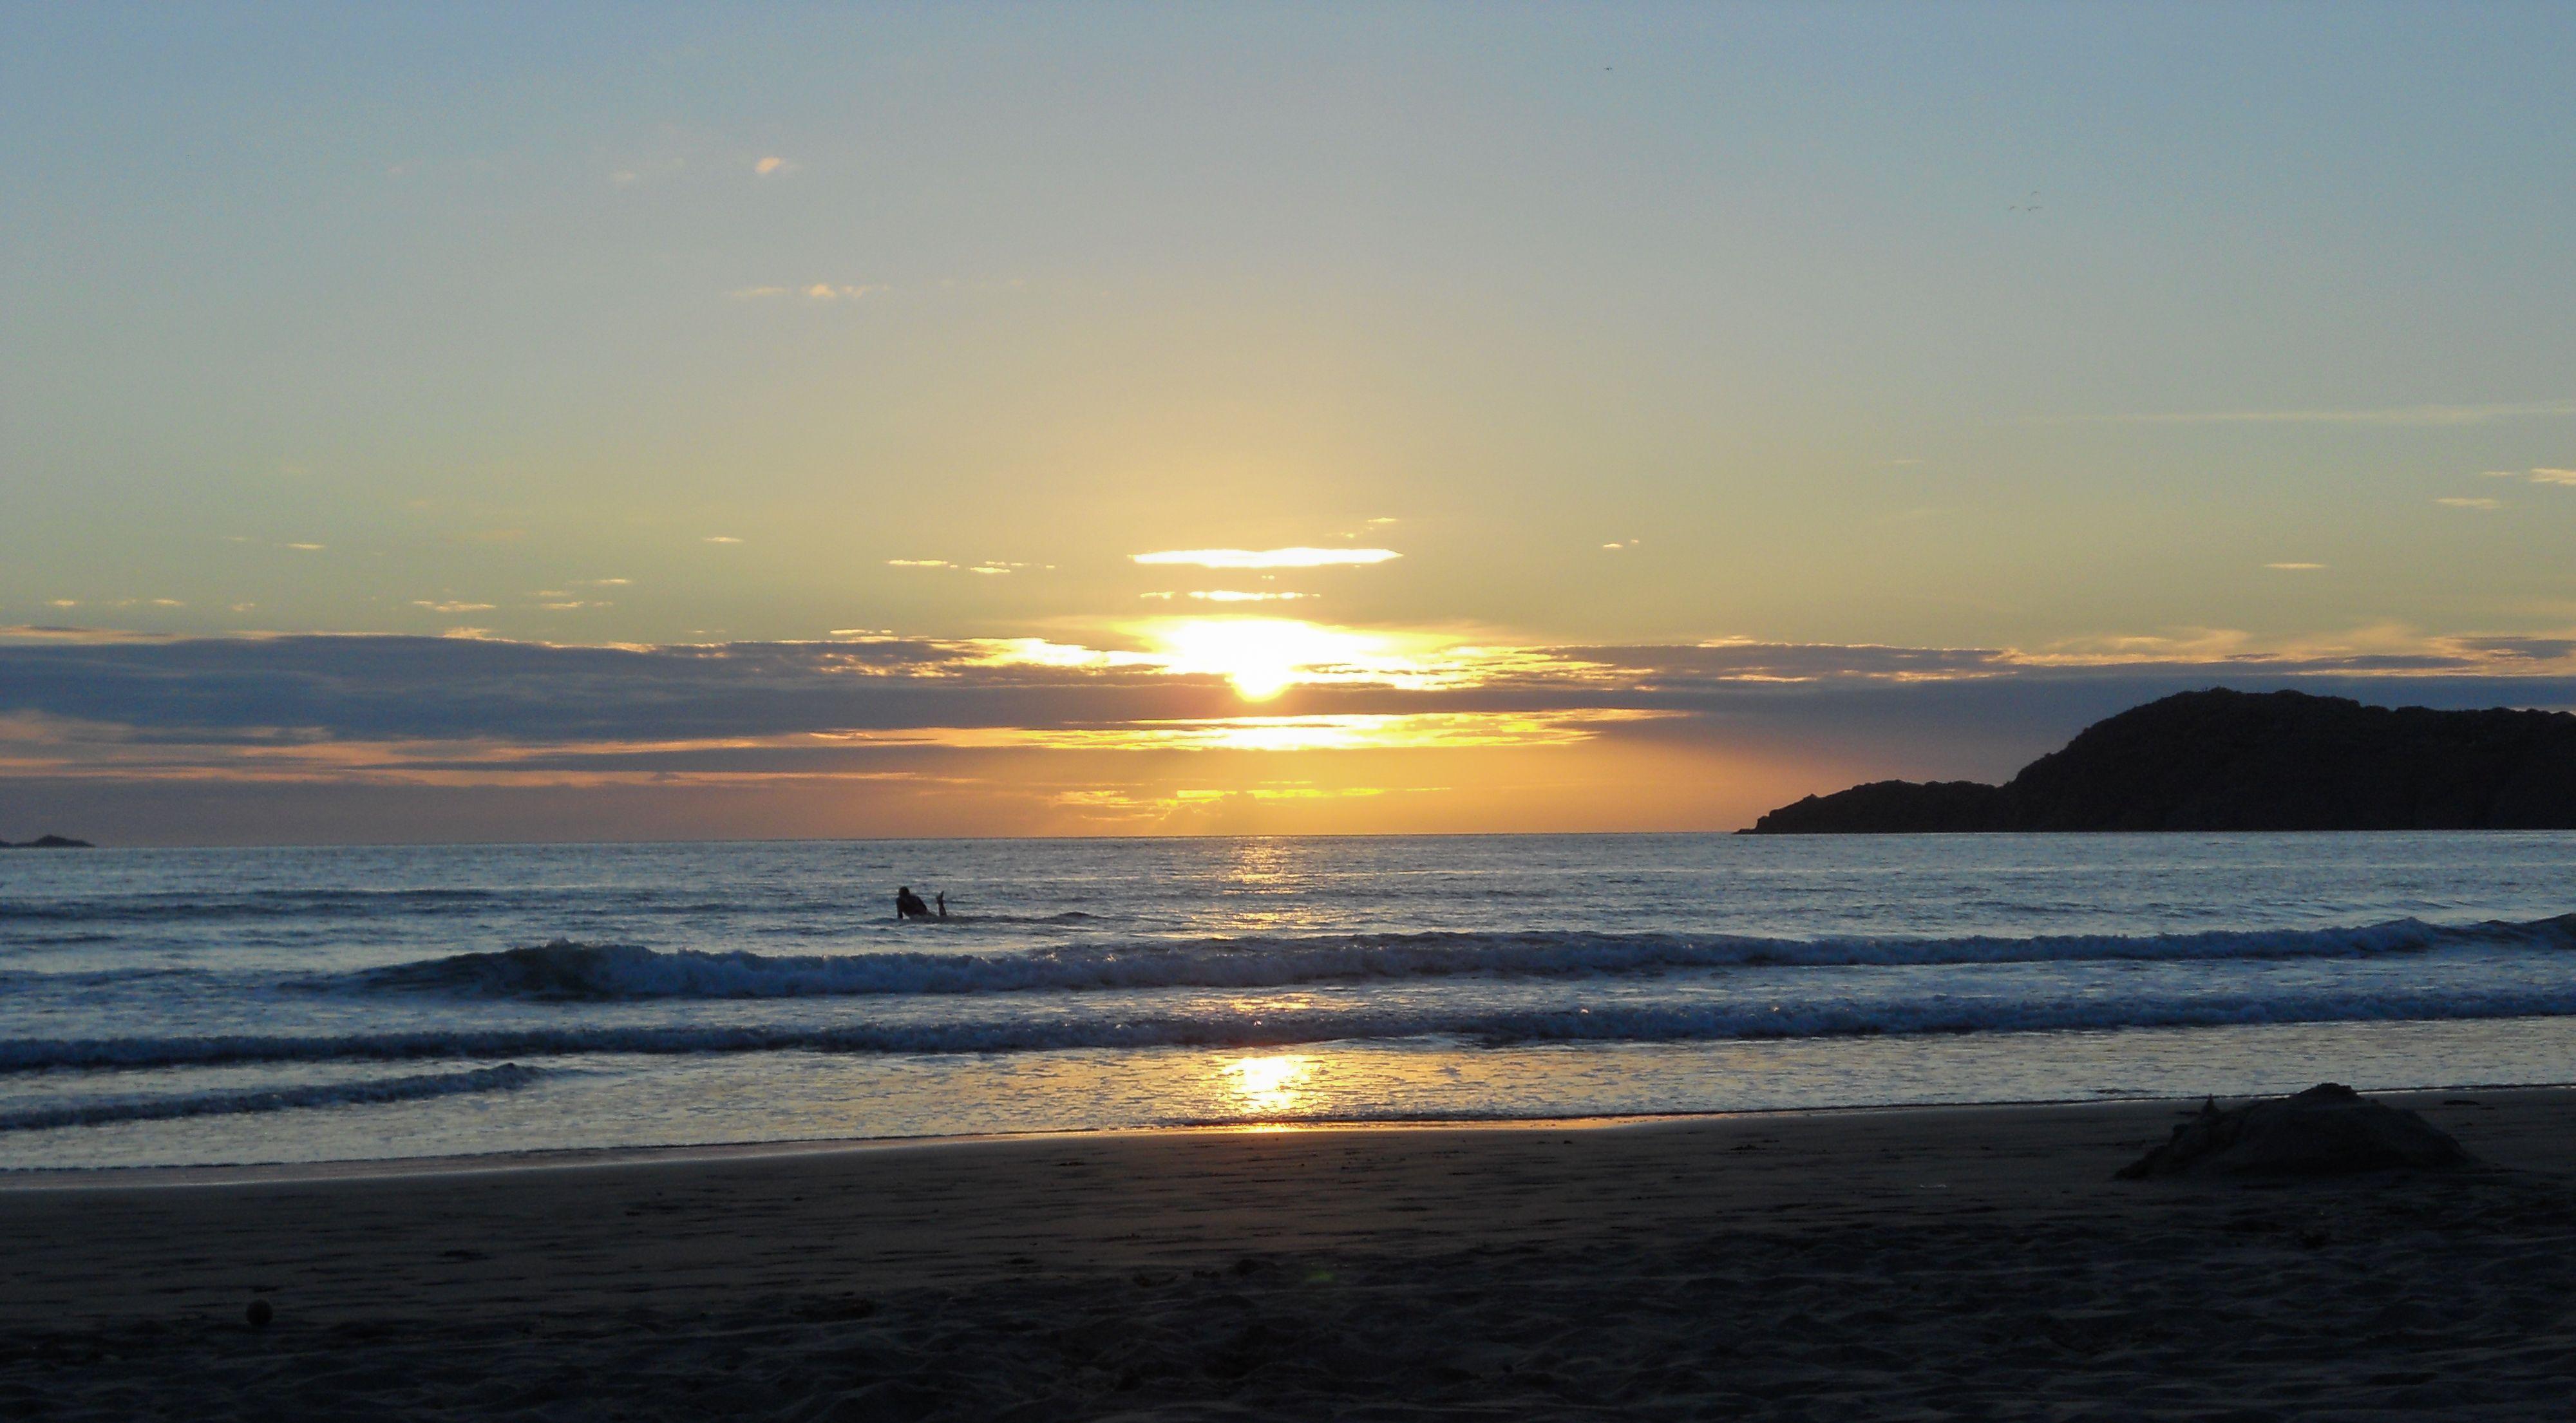 Sunset on Whitesands Beach, Wales